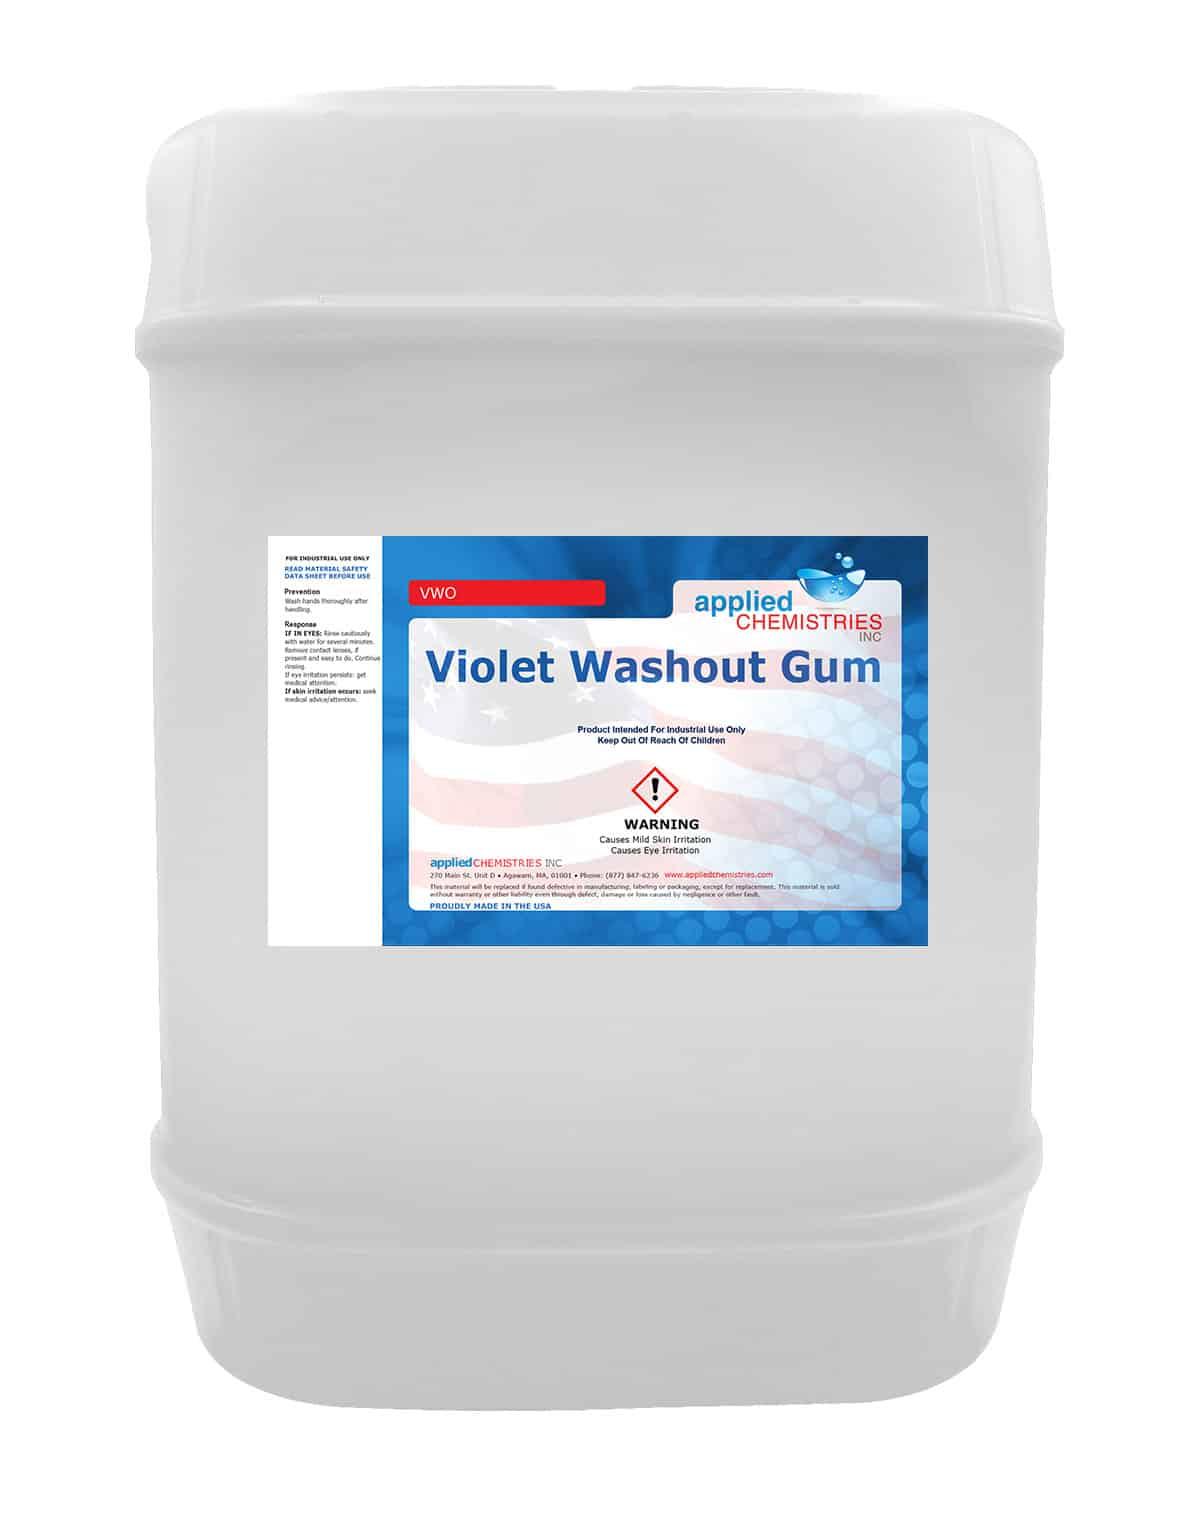 Violet Washout Gum